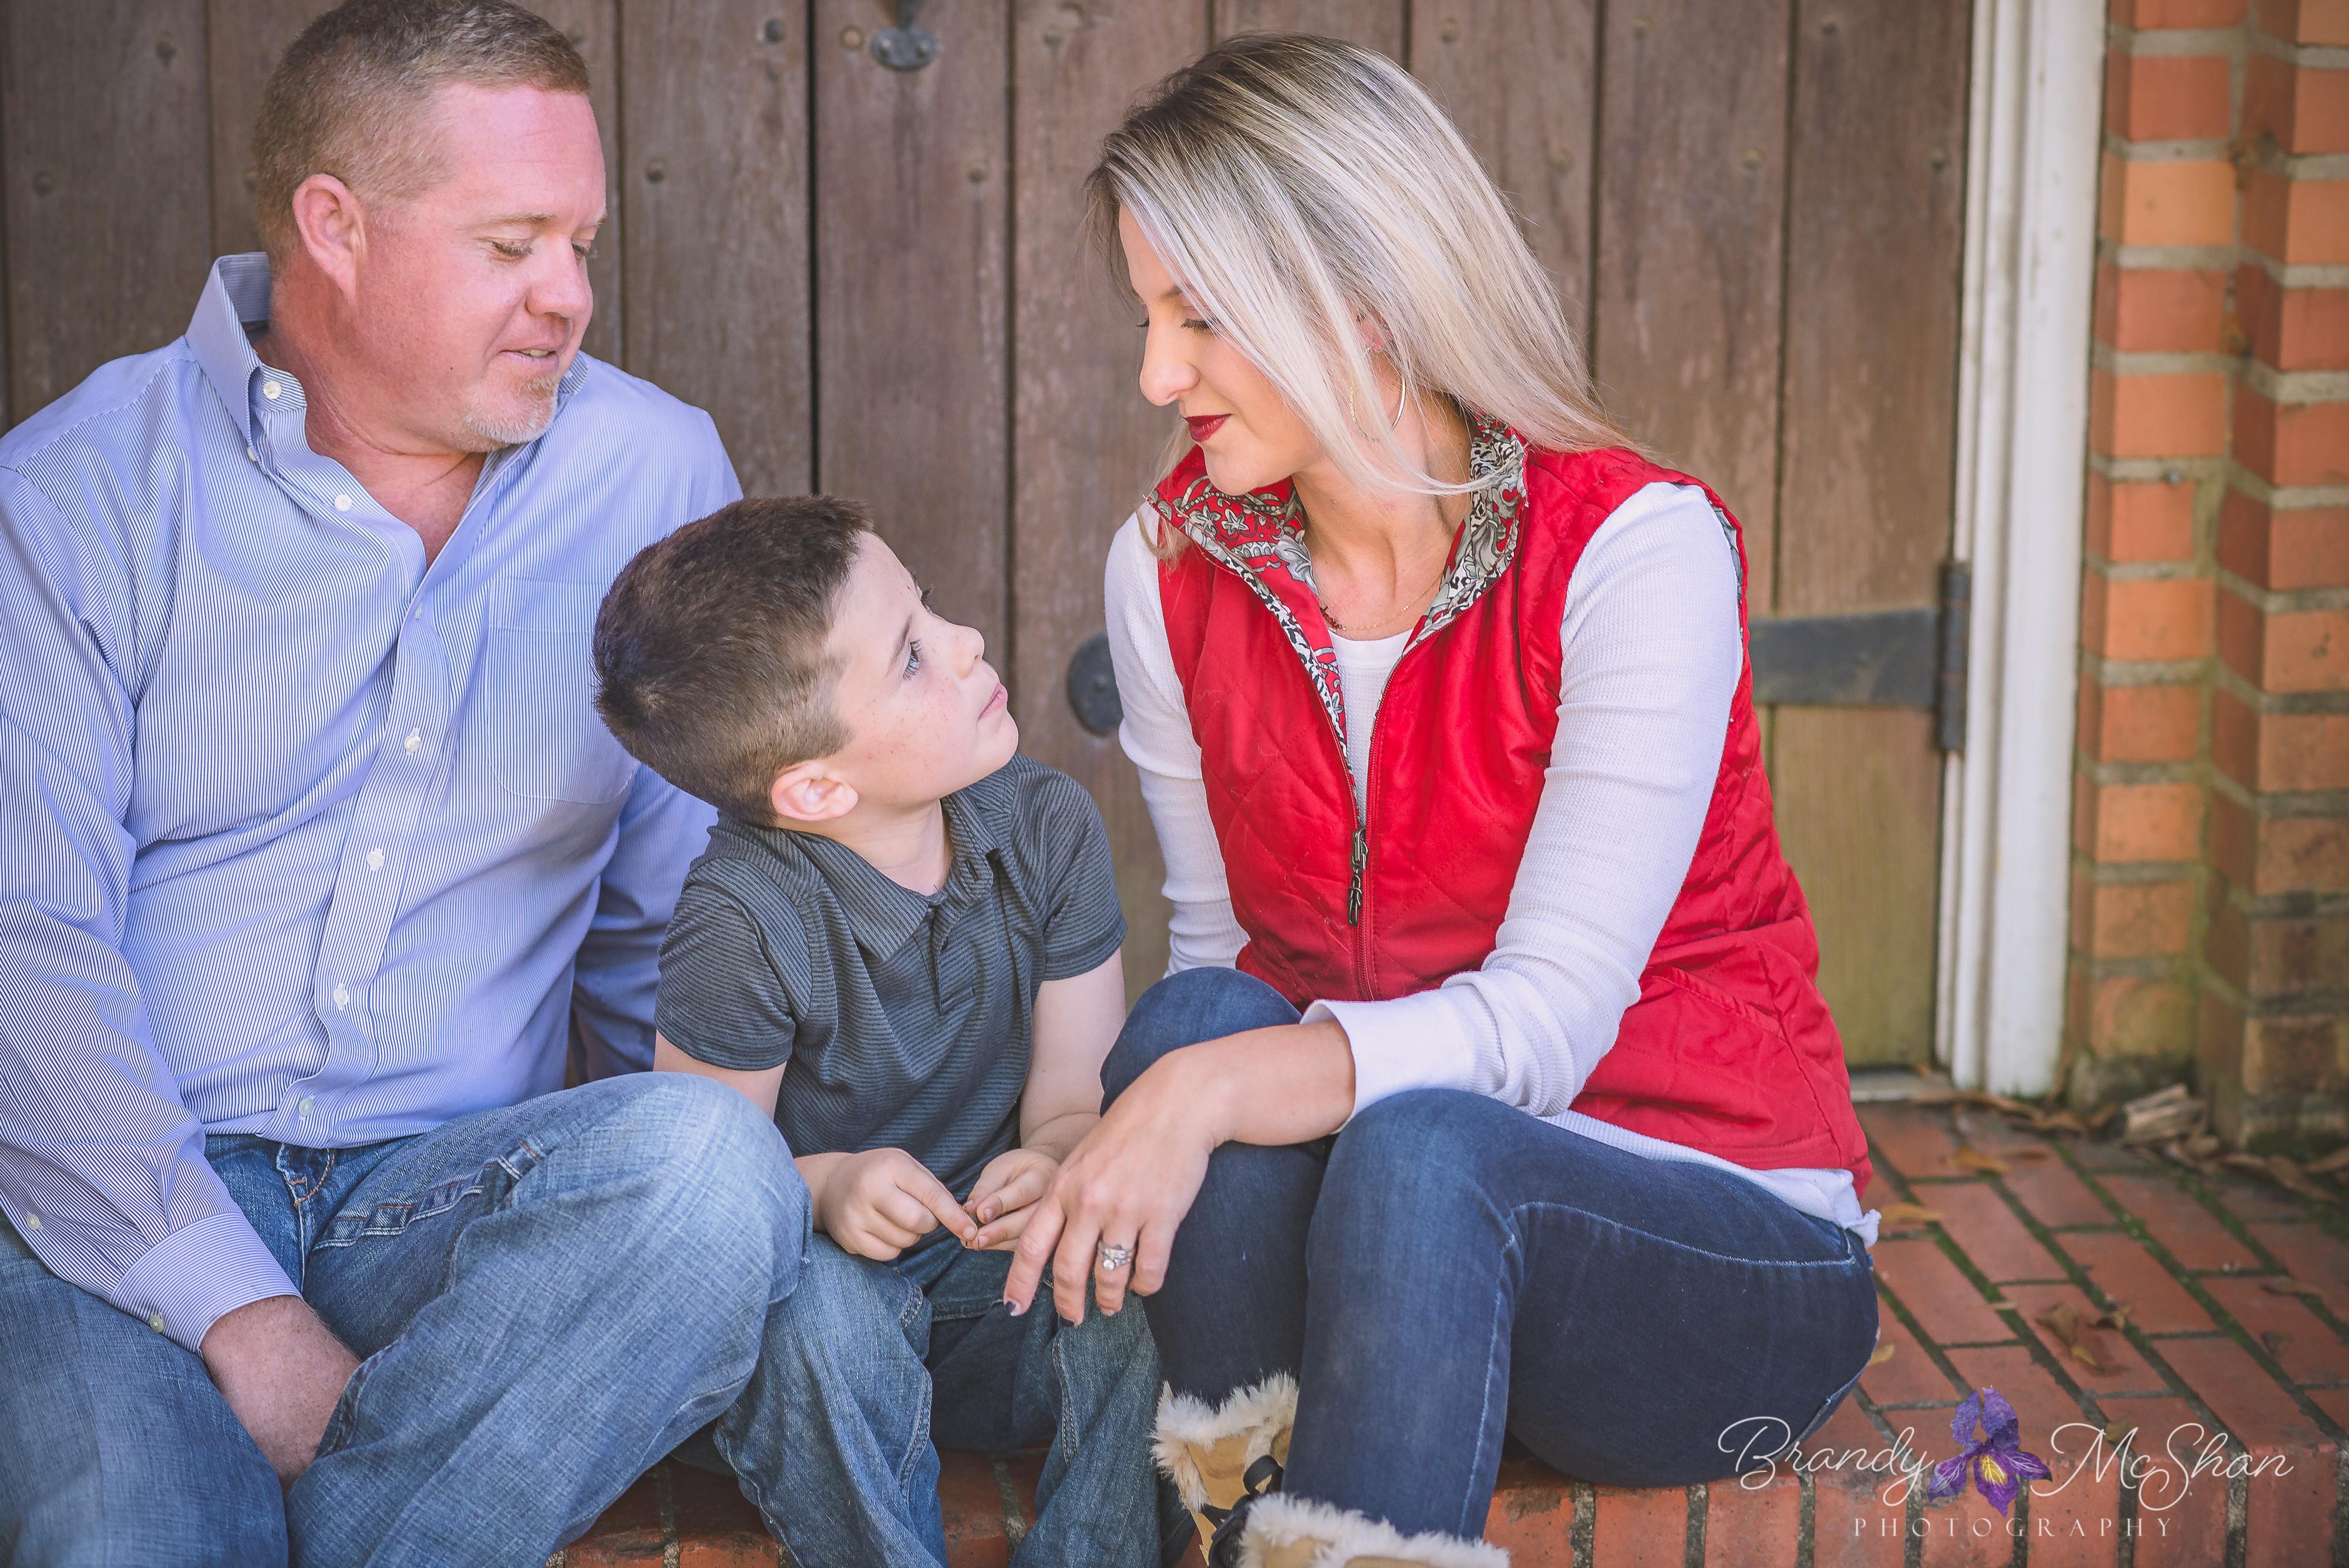 Standard Family Portrait Session